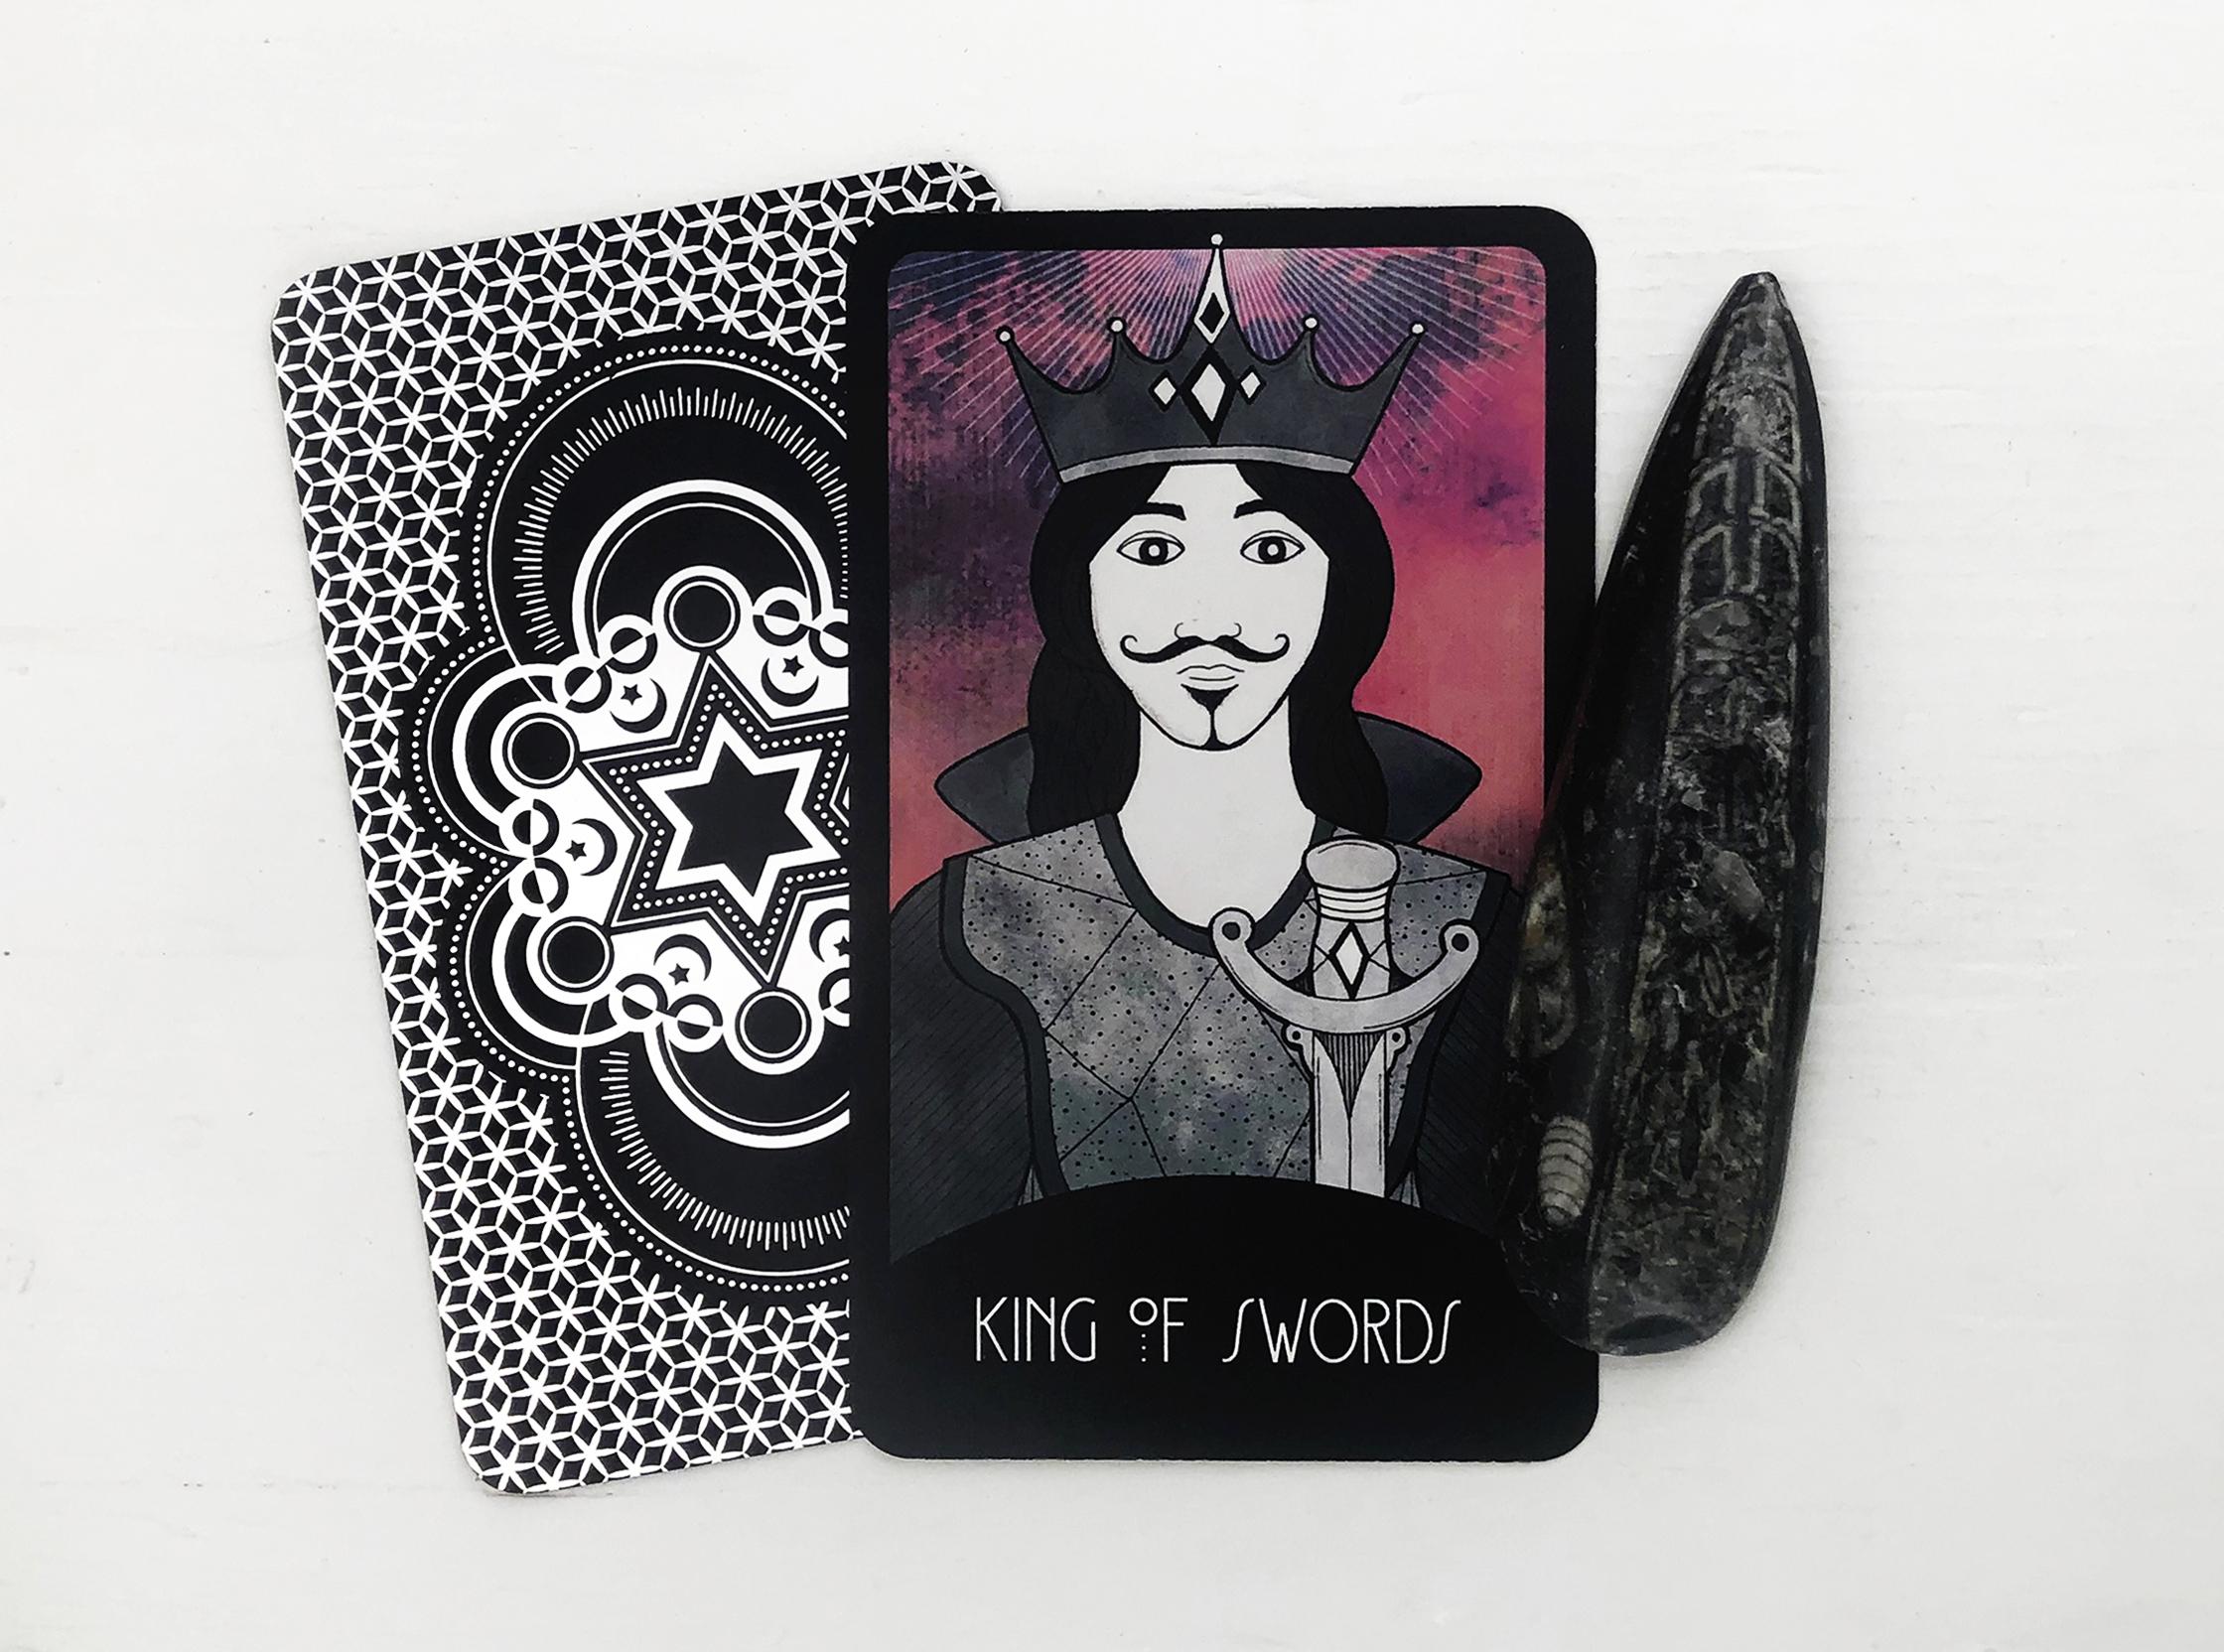 The King Of Swords Tarot Card Keen Articles 6 of stones | the charming tarot. the king of swords tarot card keen